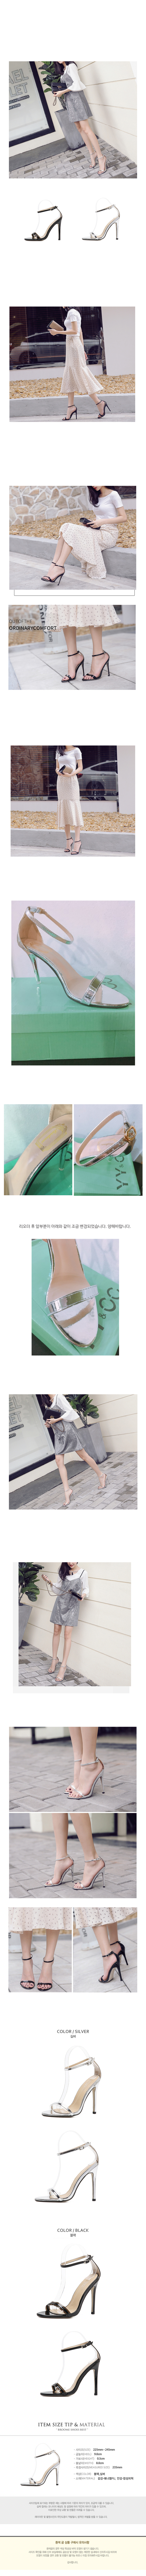 Summer strap sandals silver silver black